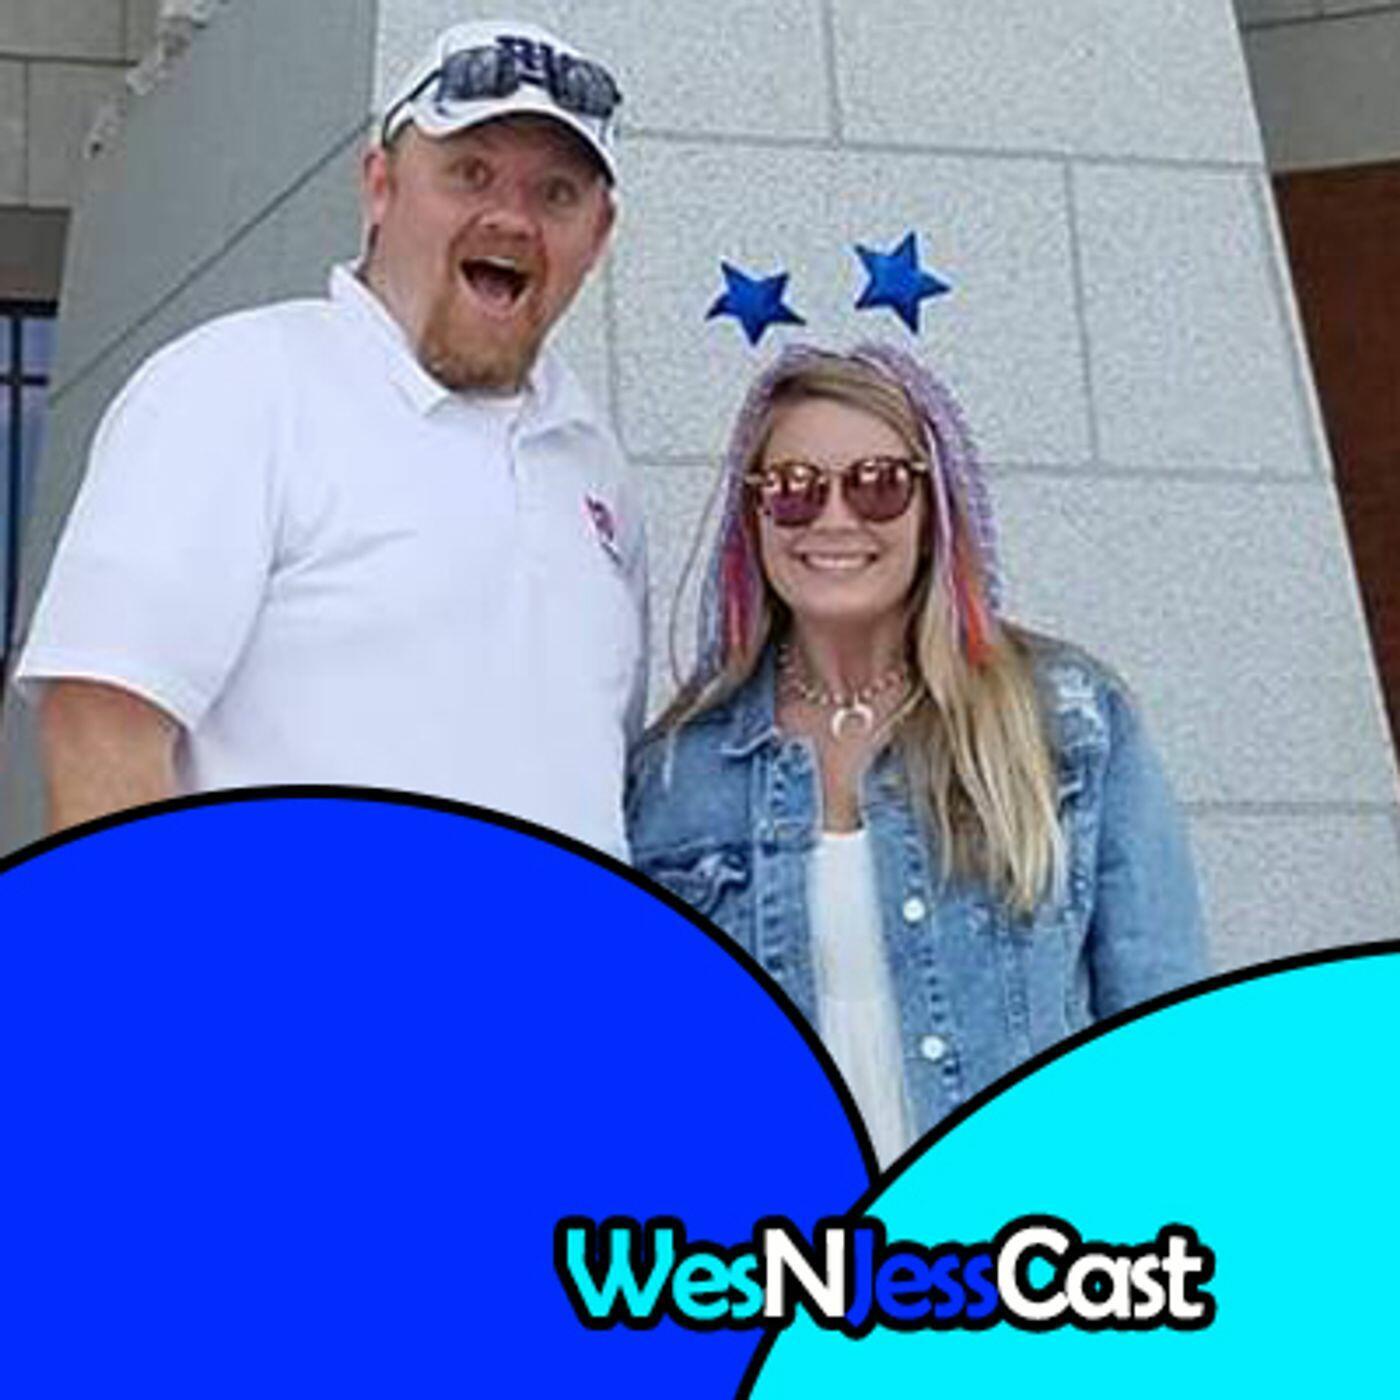 WesNJessCast